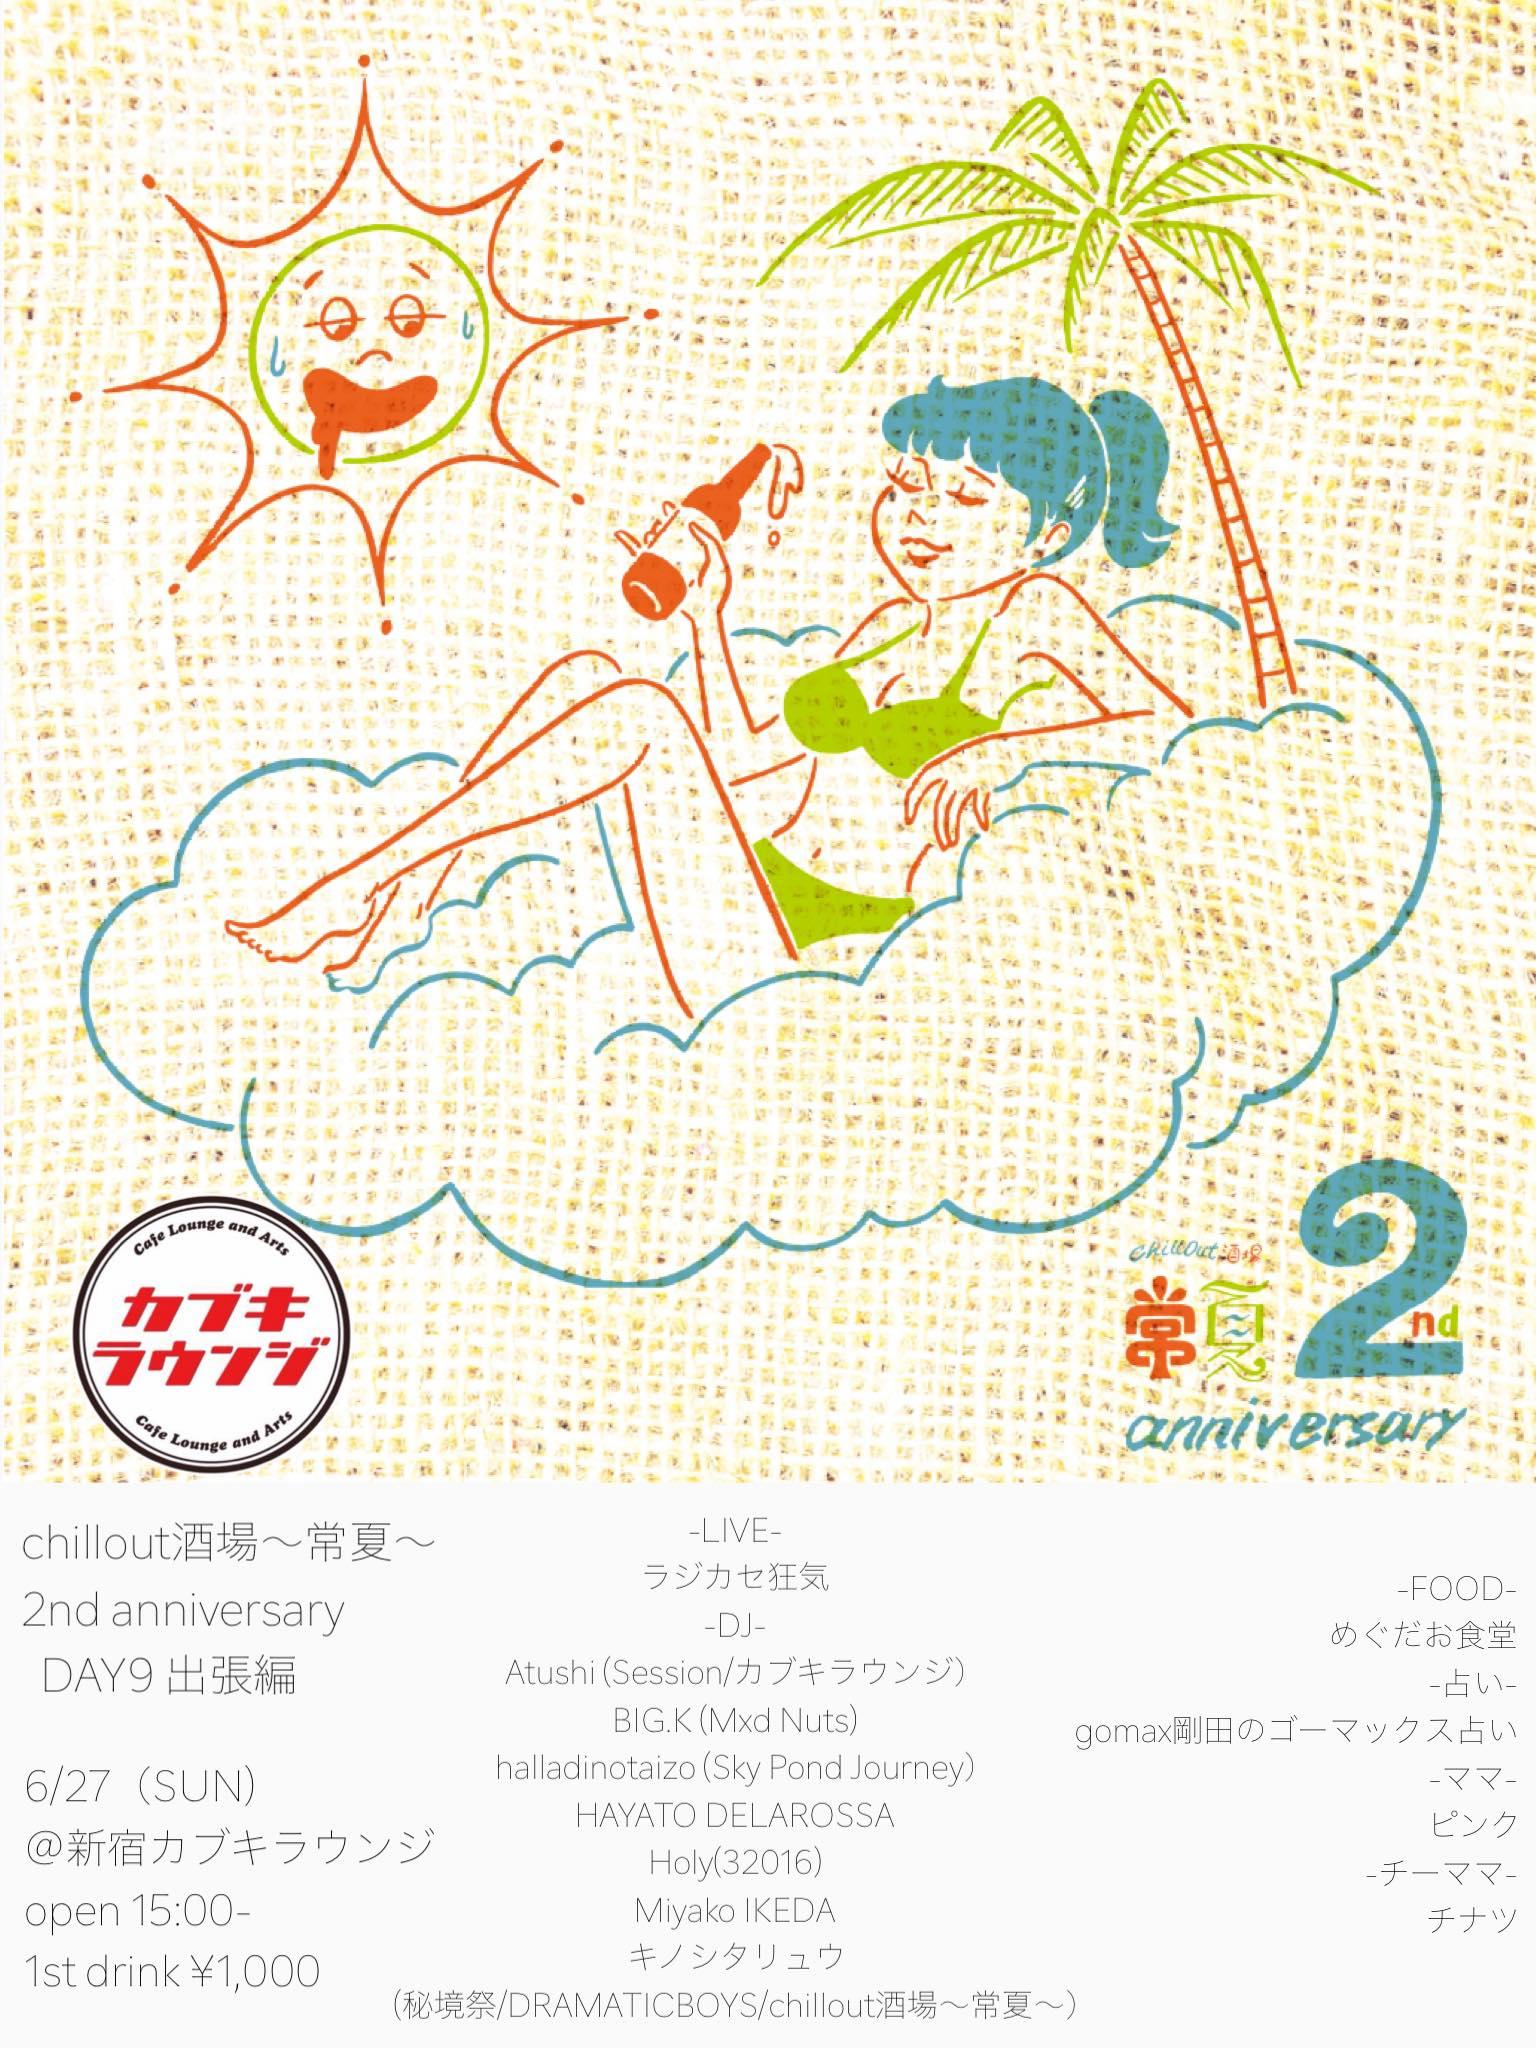 chillout酒場〜常夏〜 2nd anniversary DAY9 出張編   6/27(SUN)   @新宿カブキラウンジ